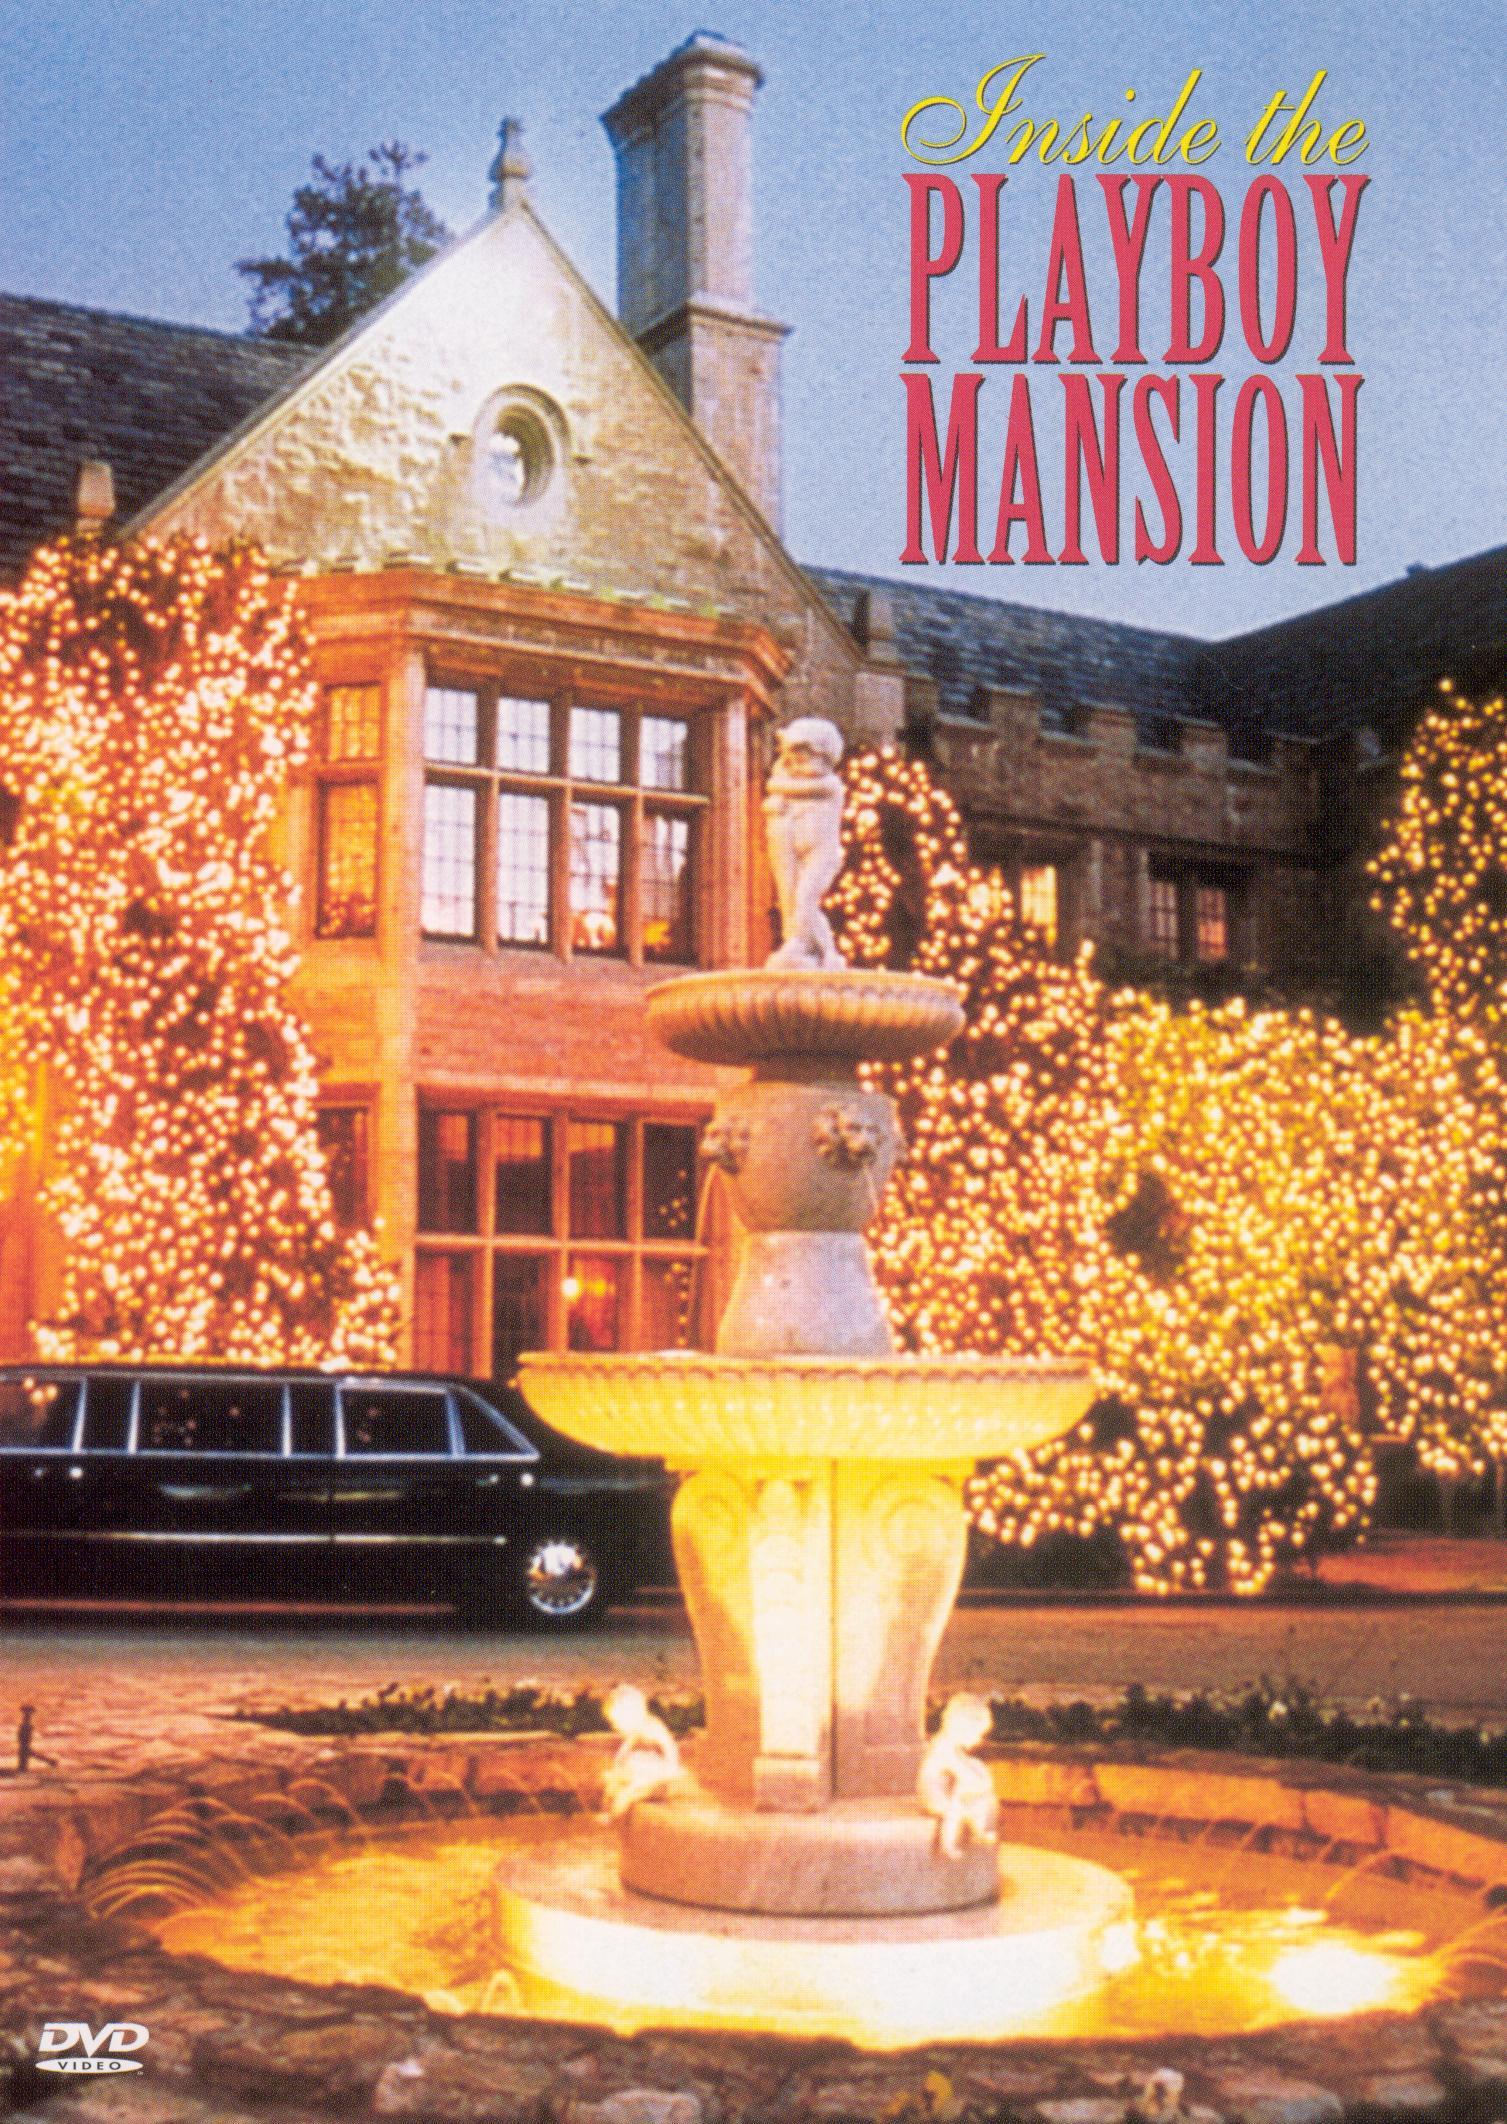 Playboy: Inside the Playboy Mansion